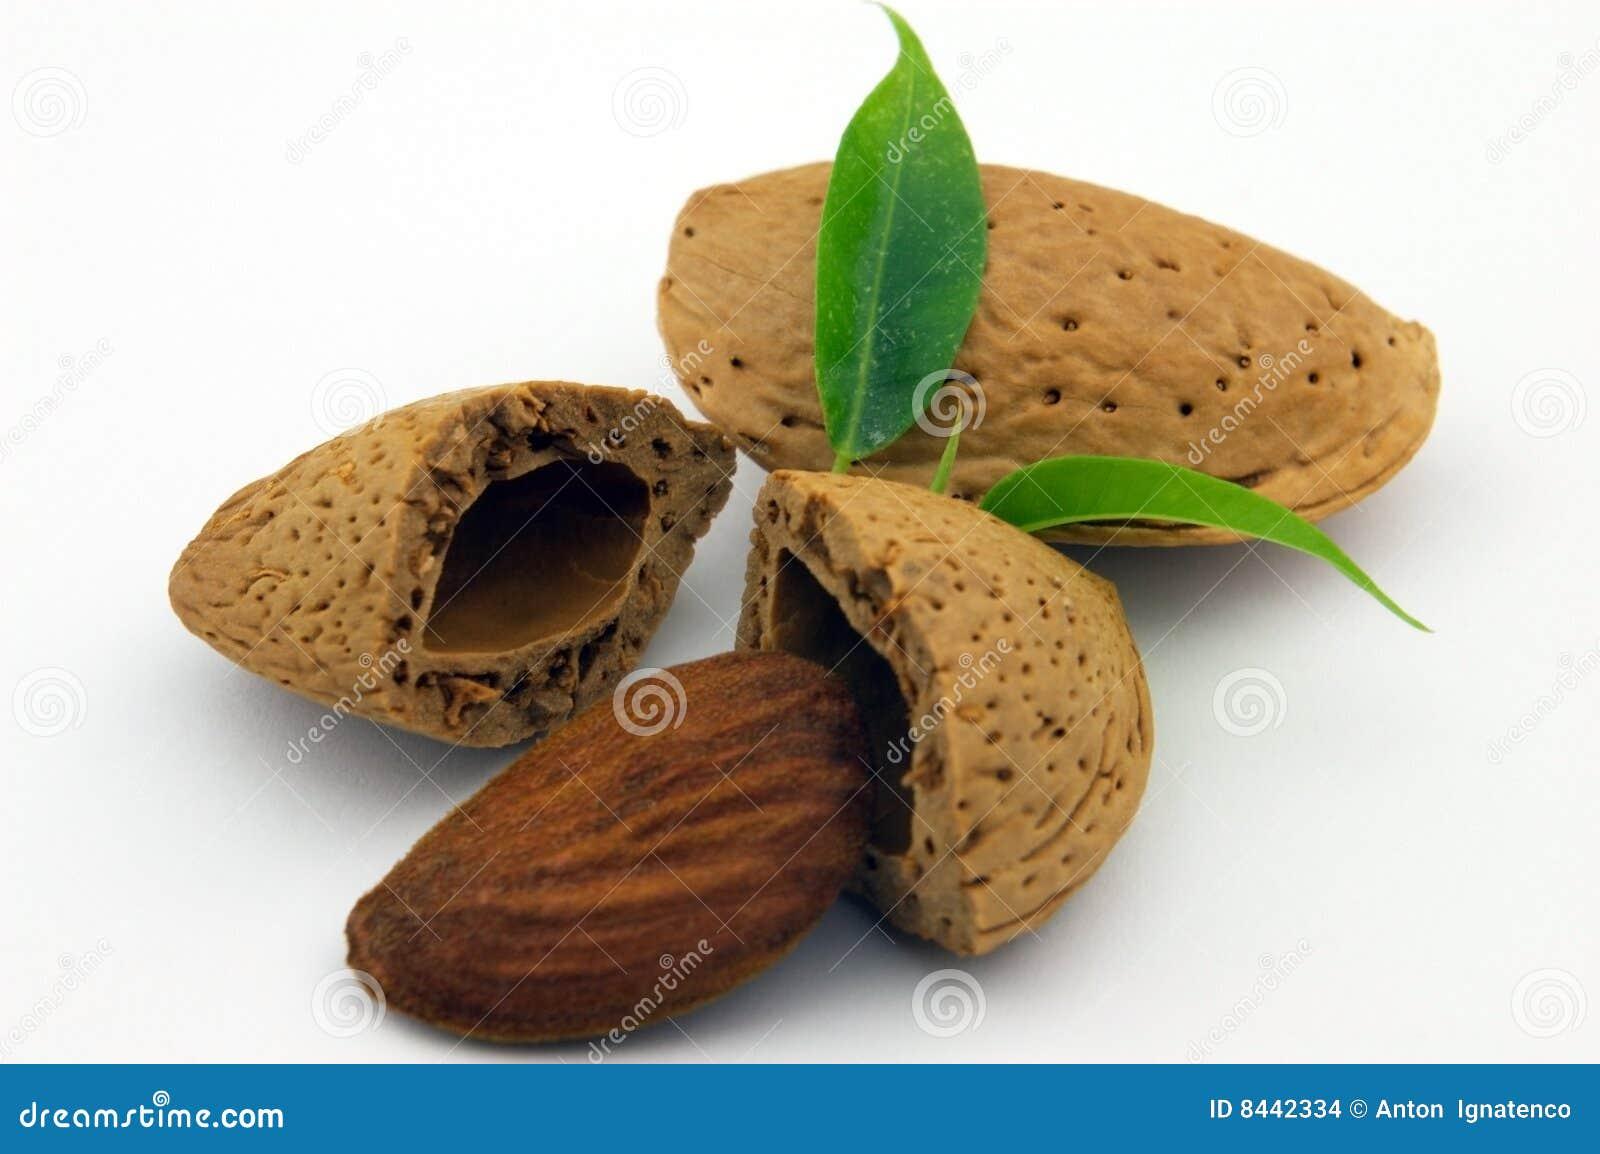 Amande with leaf